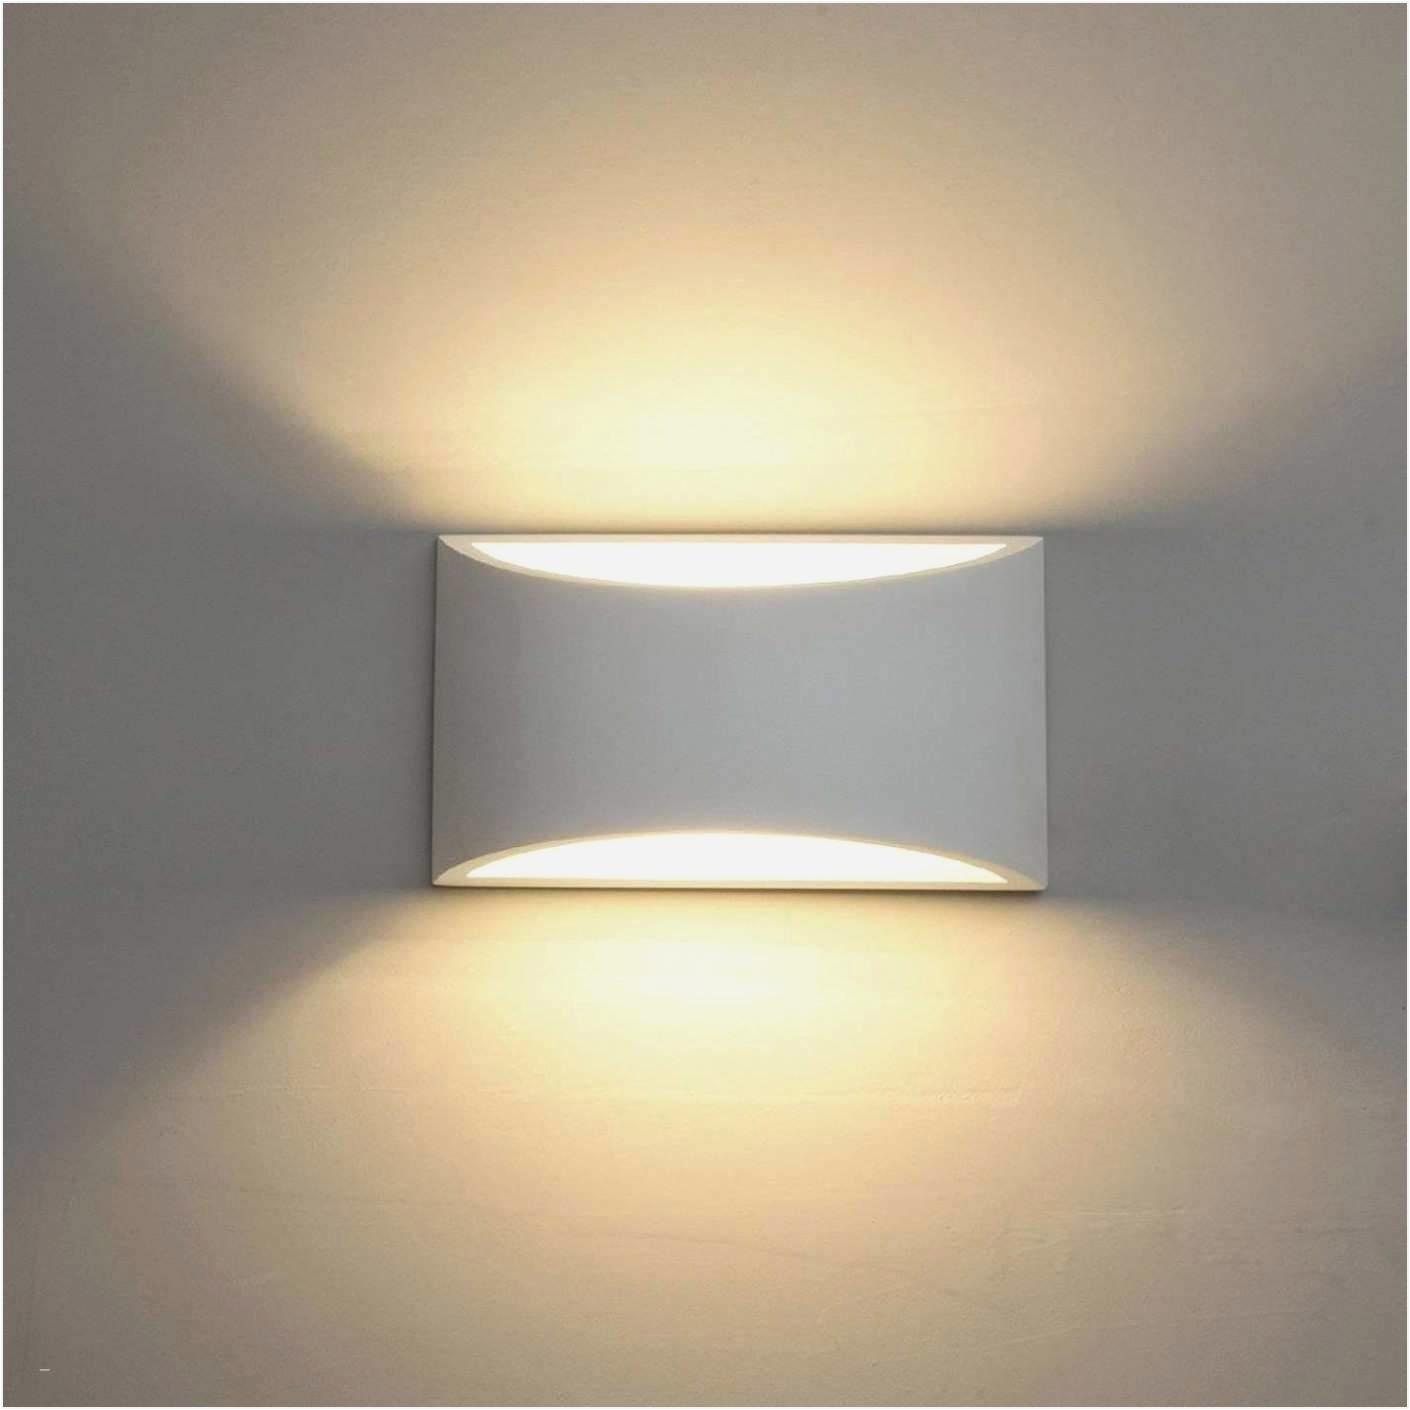 led fr wohnzimmer lampe